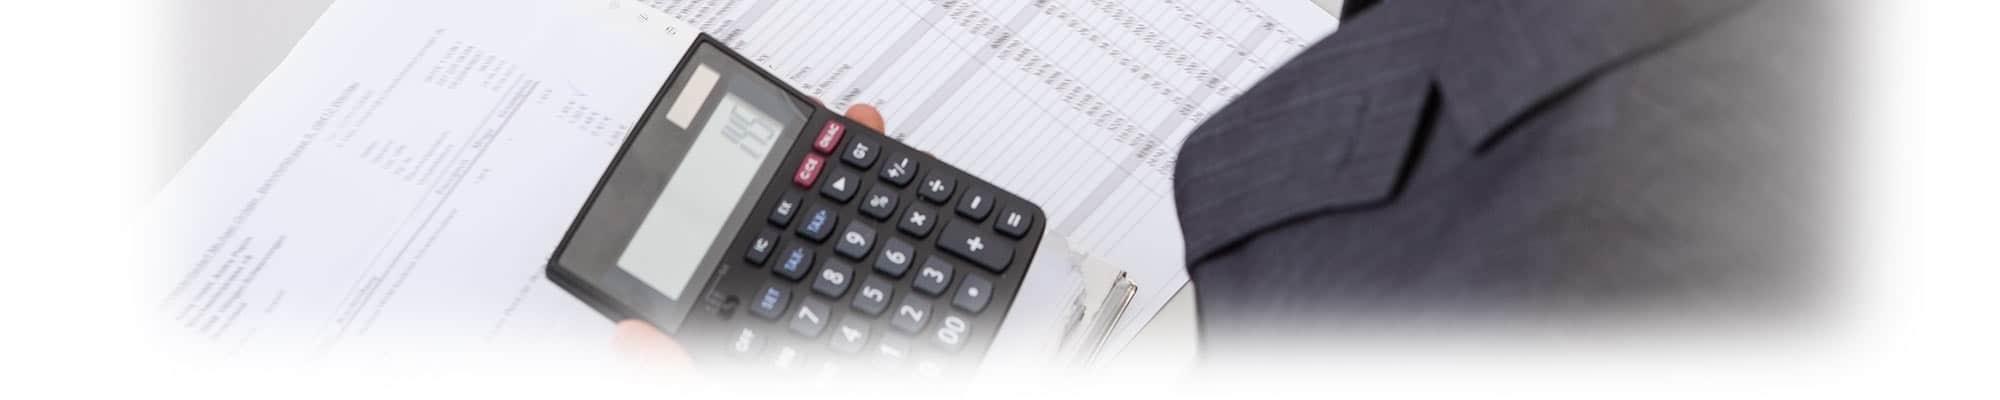 Millennium 3 Capital Financial Features